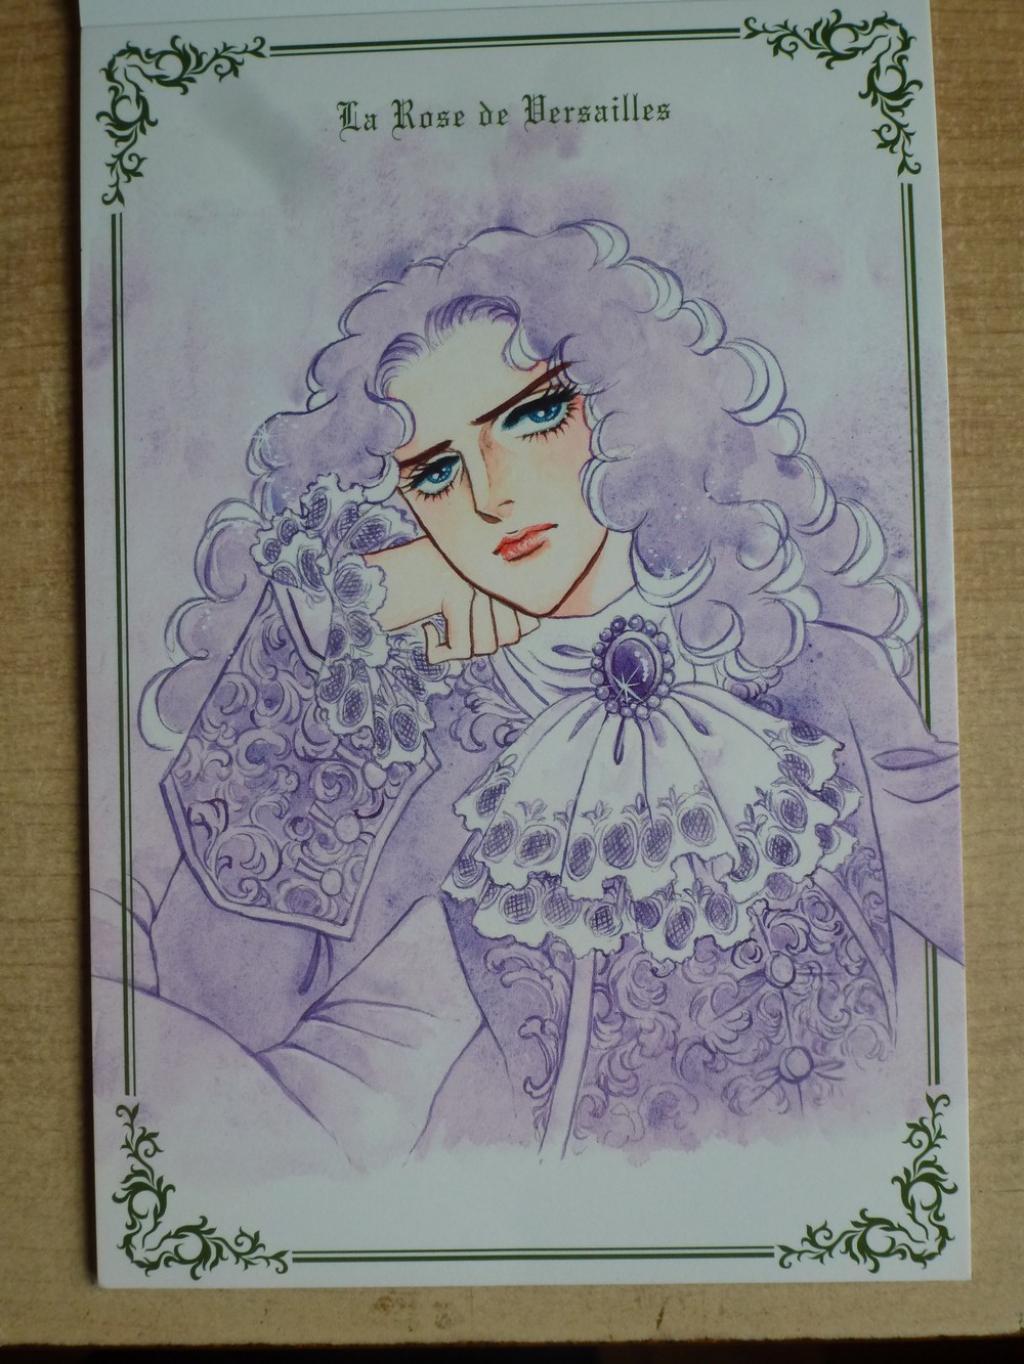 Des cartes postales La Rose de Versailles!  P1070232-56cfadf